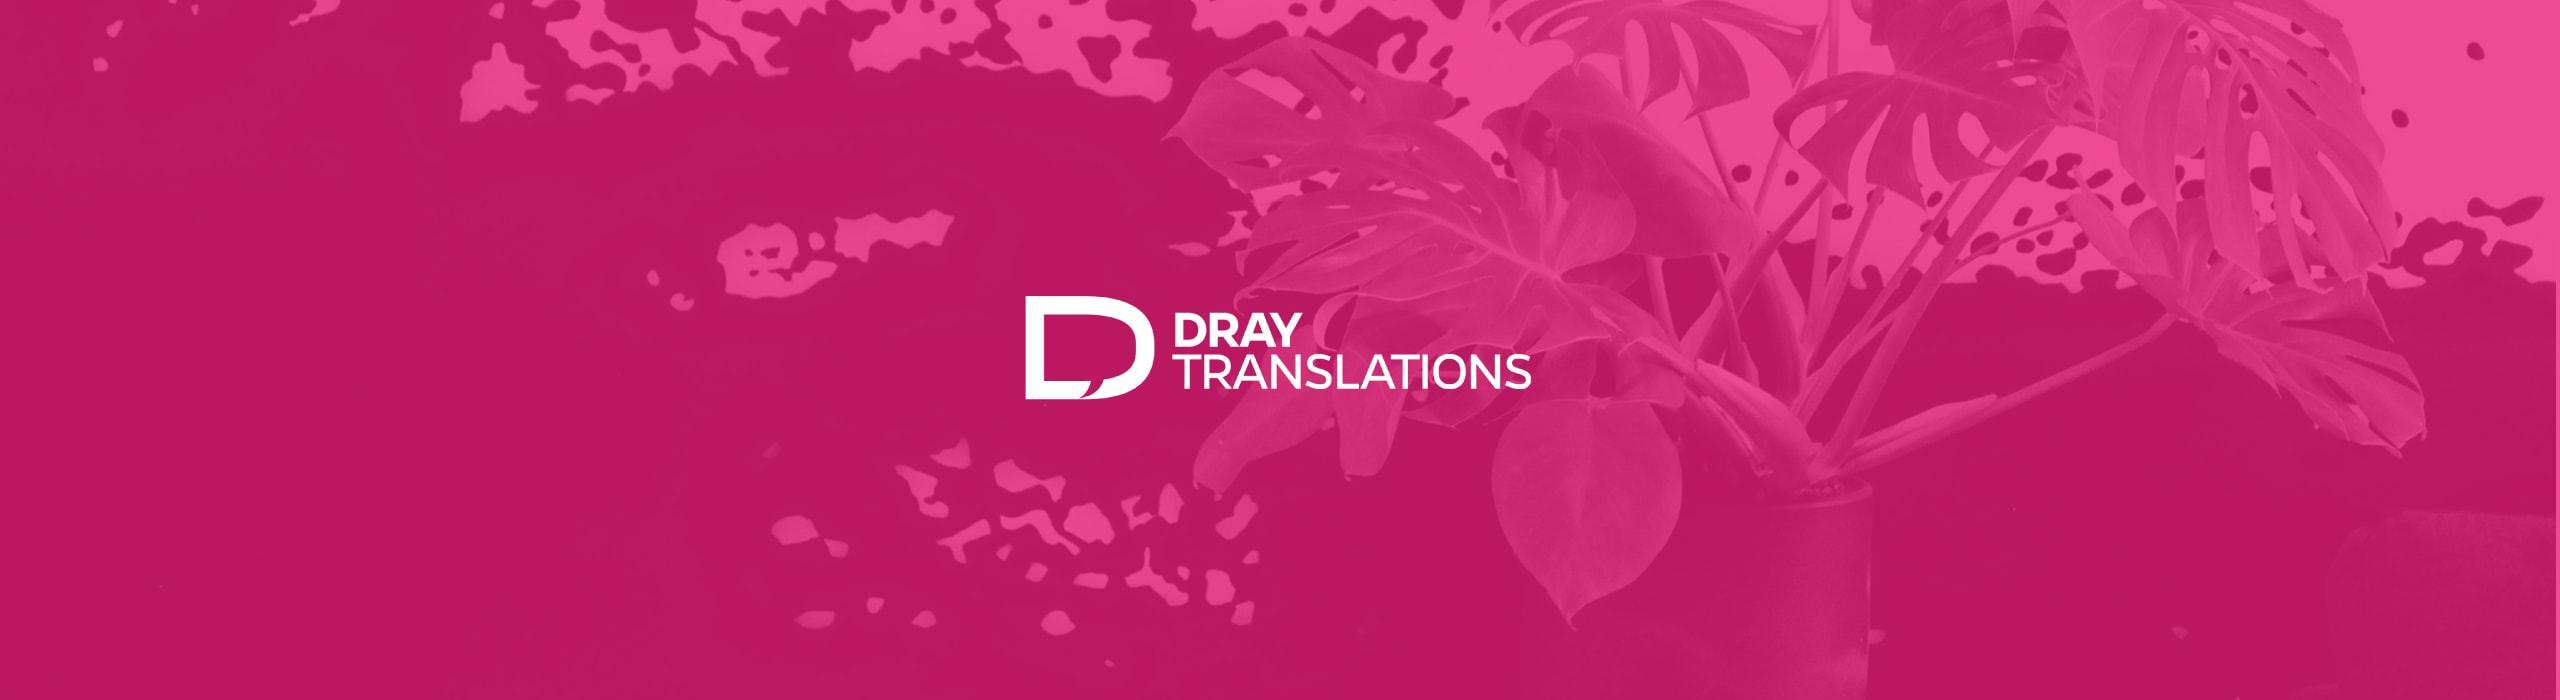 Dray Translations - Dray_top4 - Natie Branding Agency